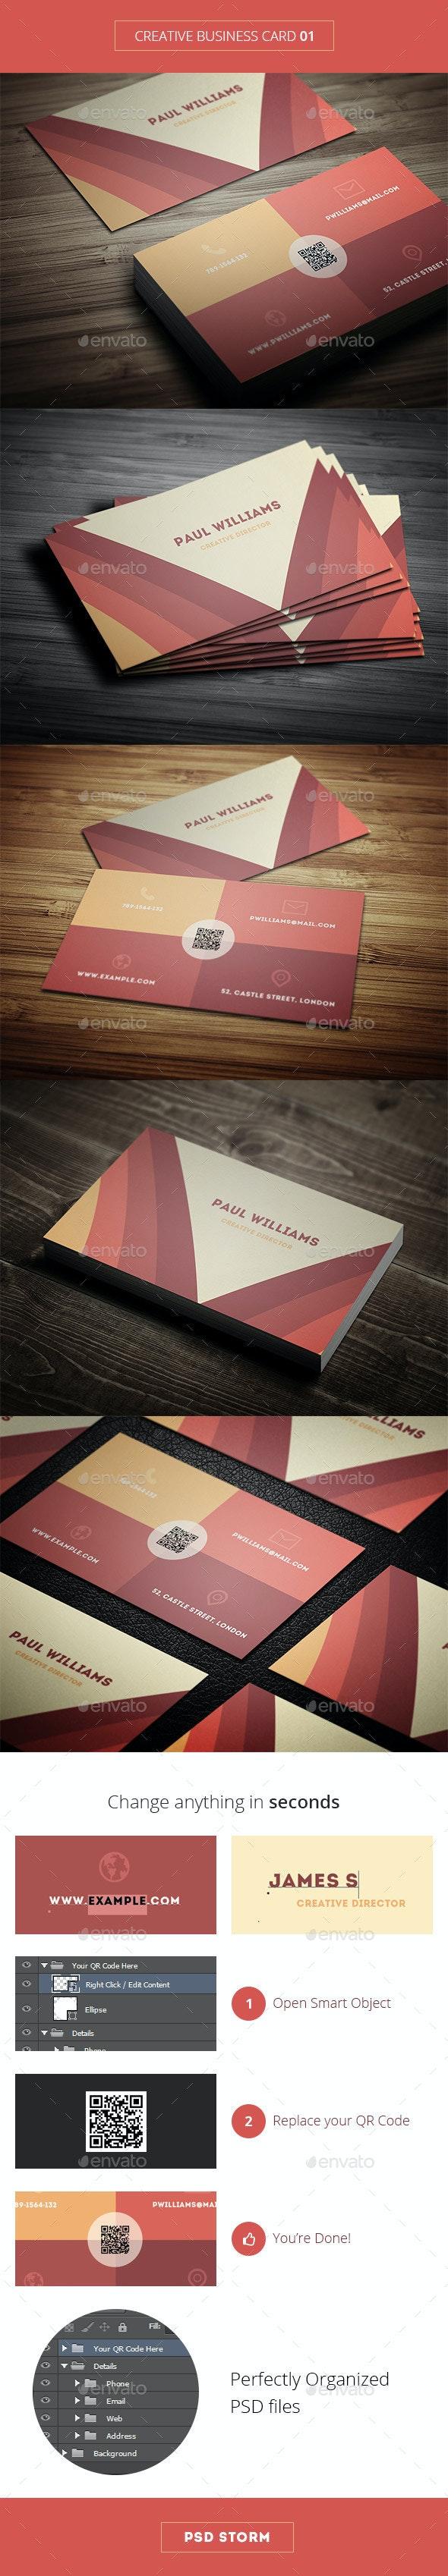 Creative Business Card 01 - Creative Business Cards